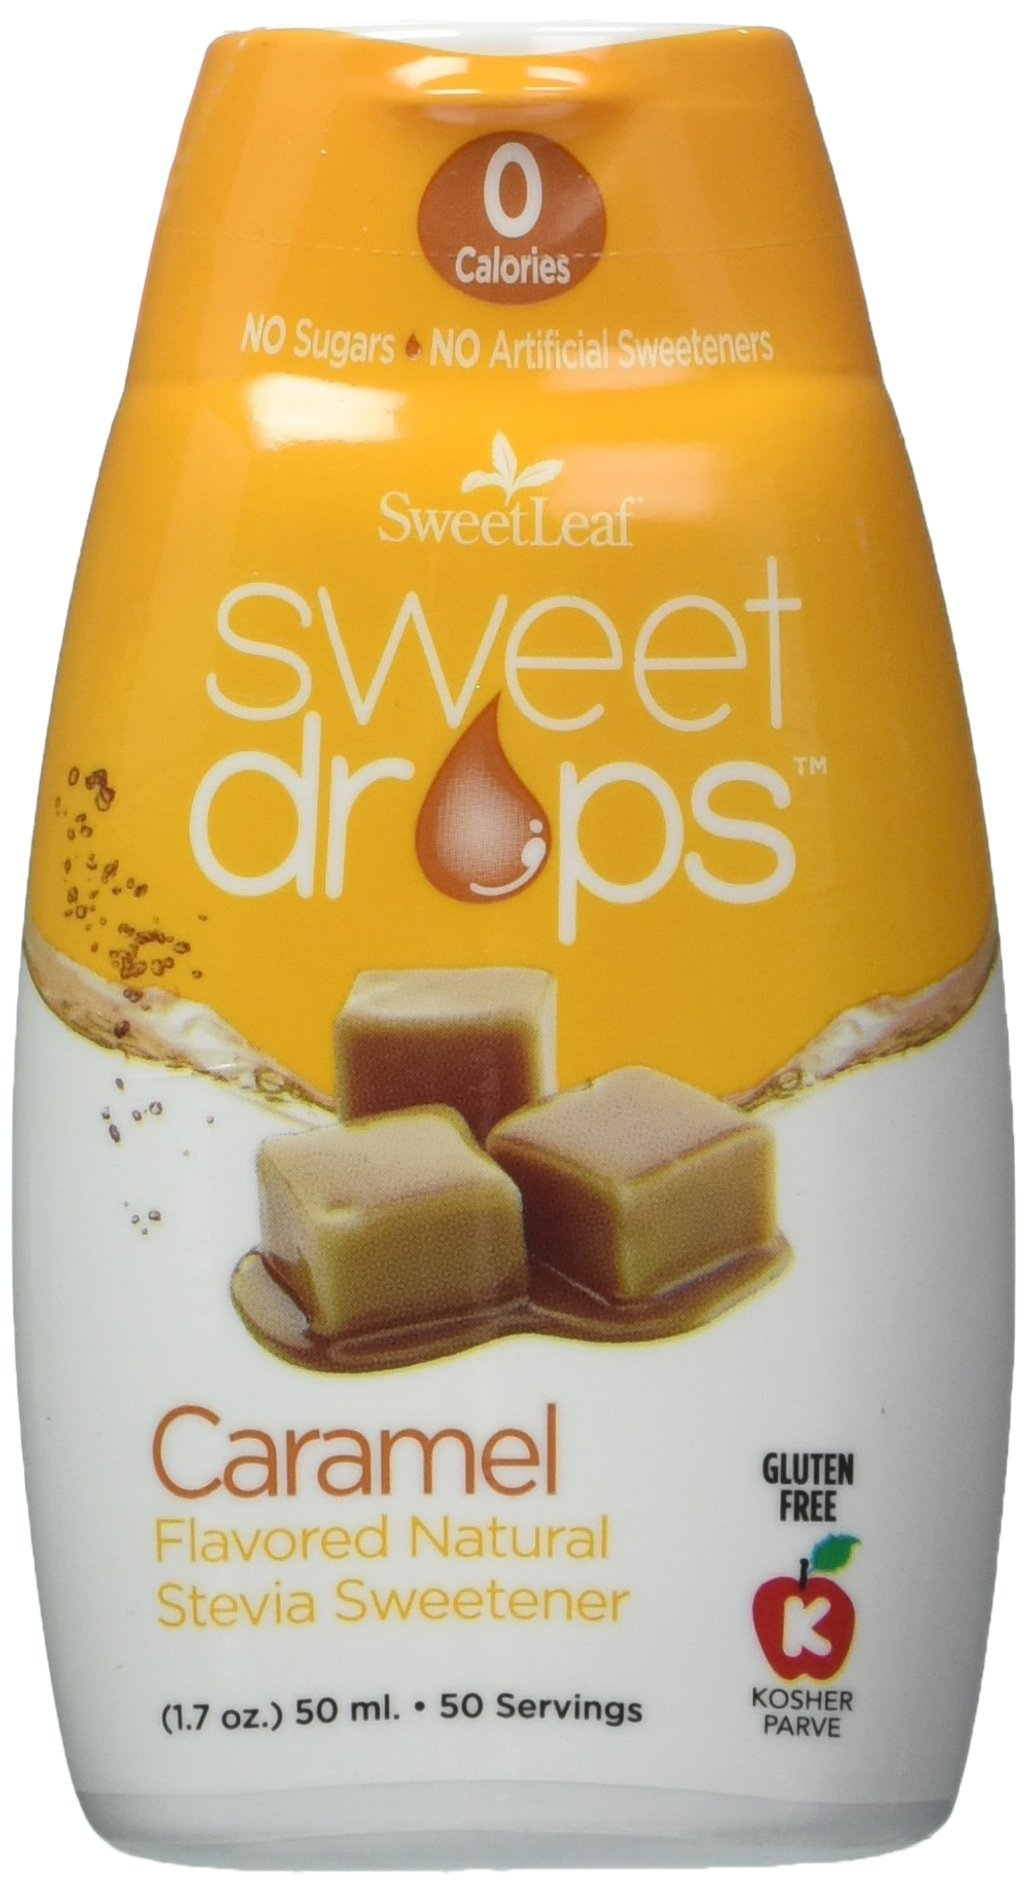 SweetLeaf Sweet Drops Liquid Stevia Sweetener, Caramel, 1.7 Ounce